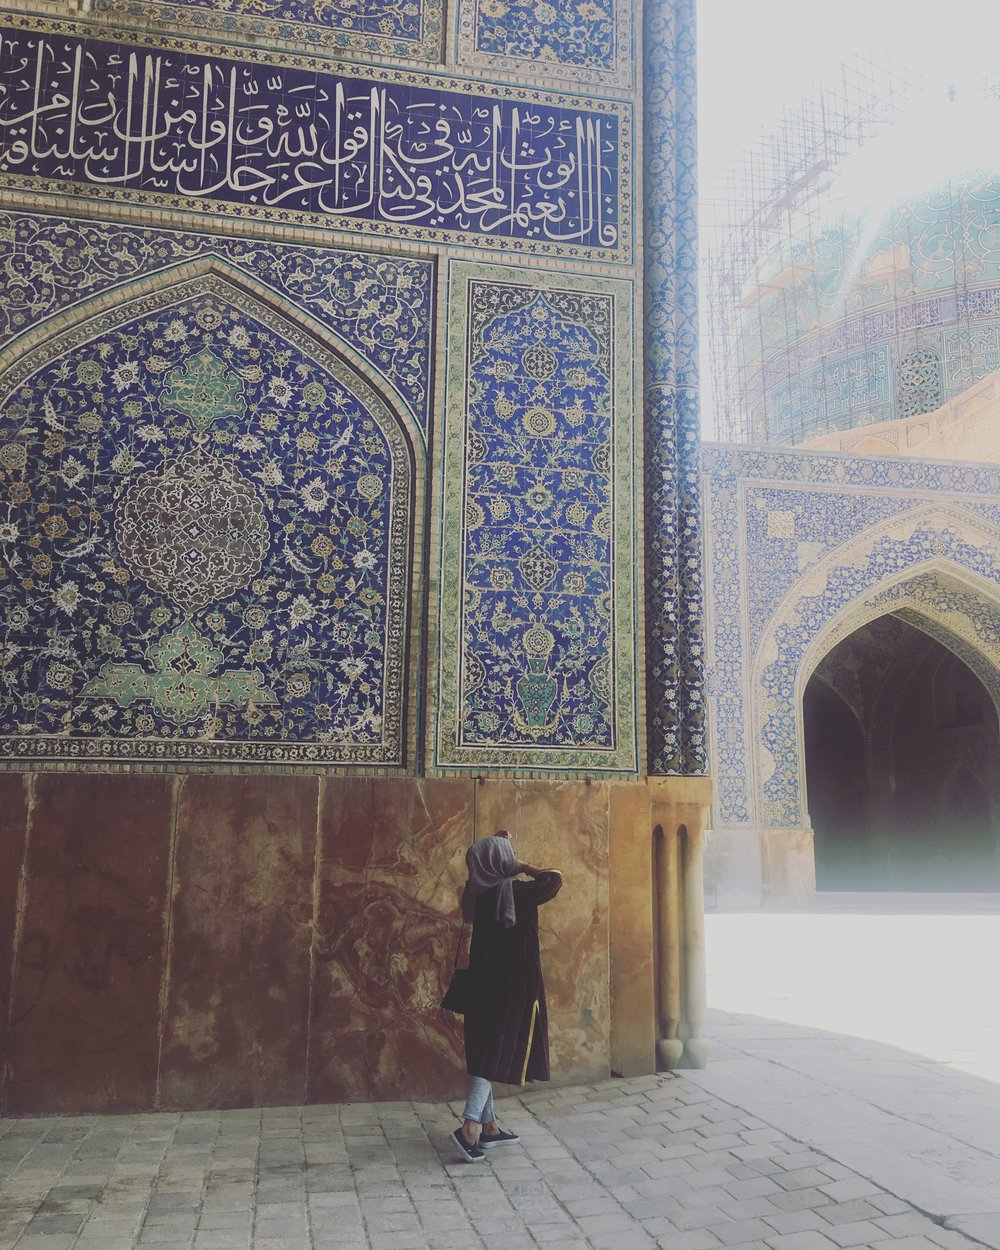 Masjid Imam / Isfahan. Iran